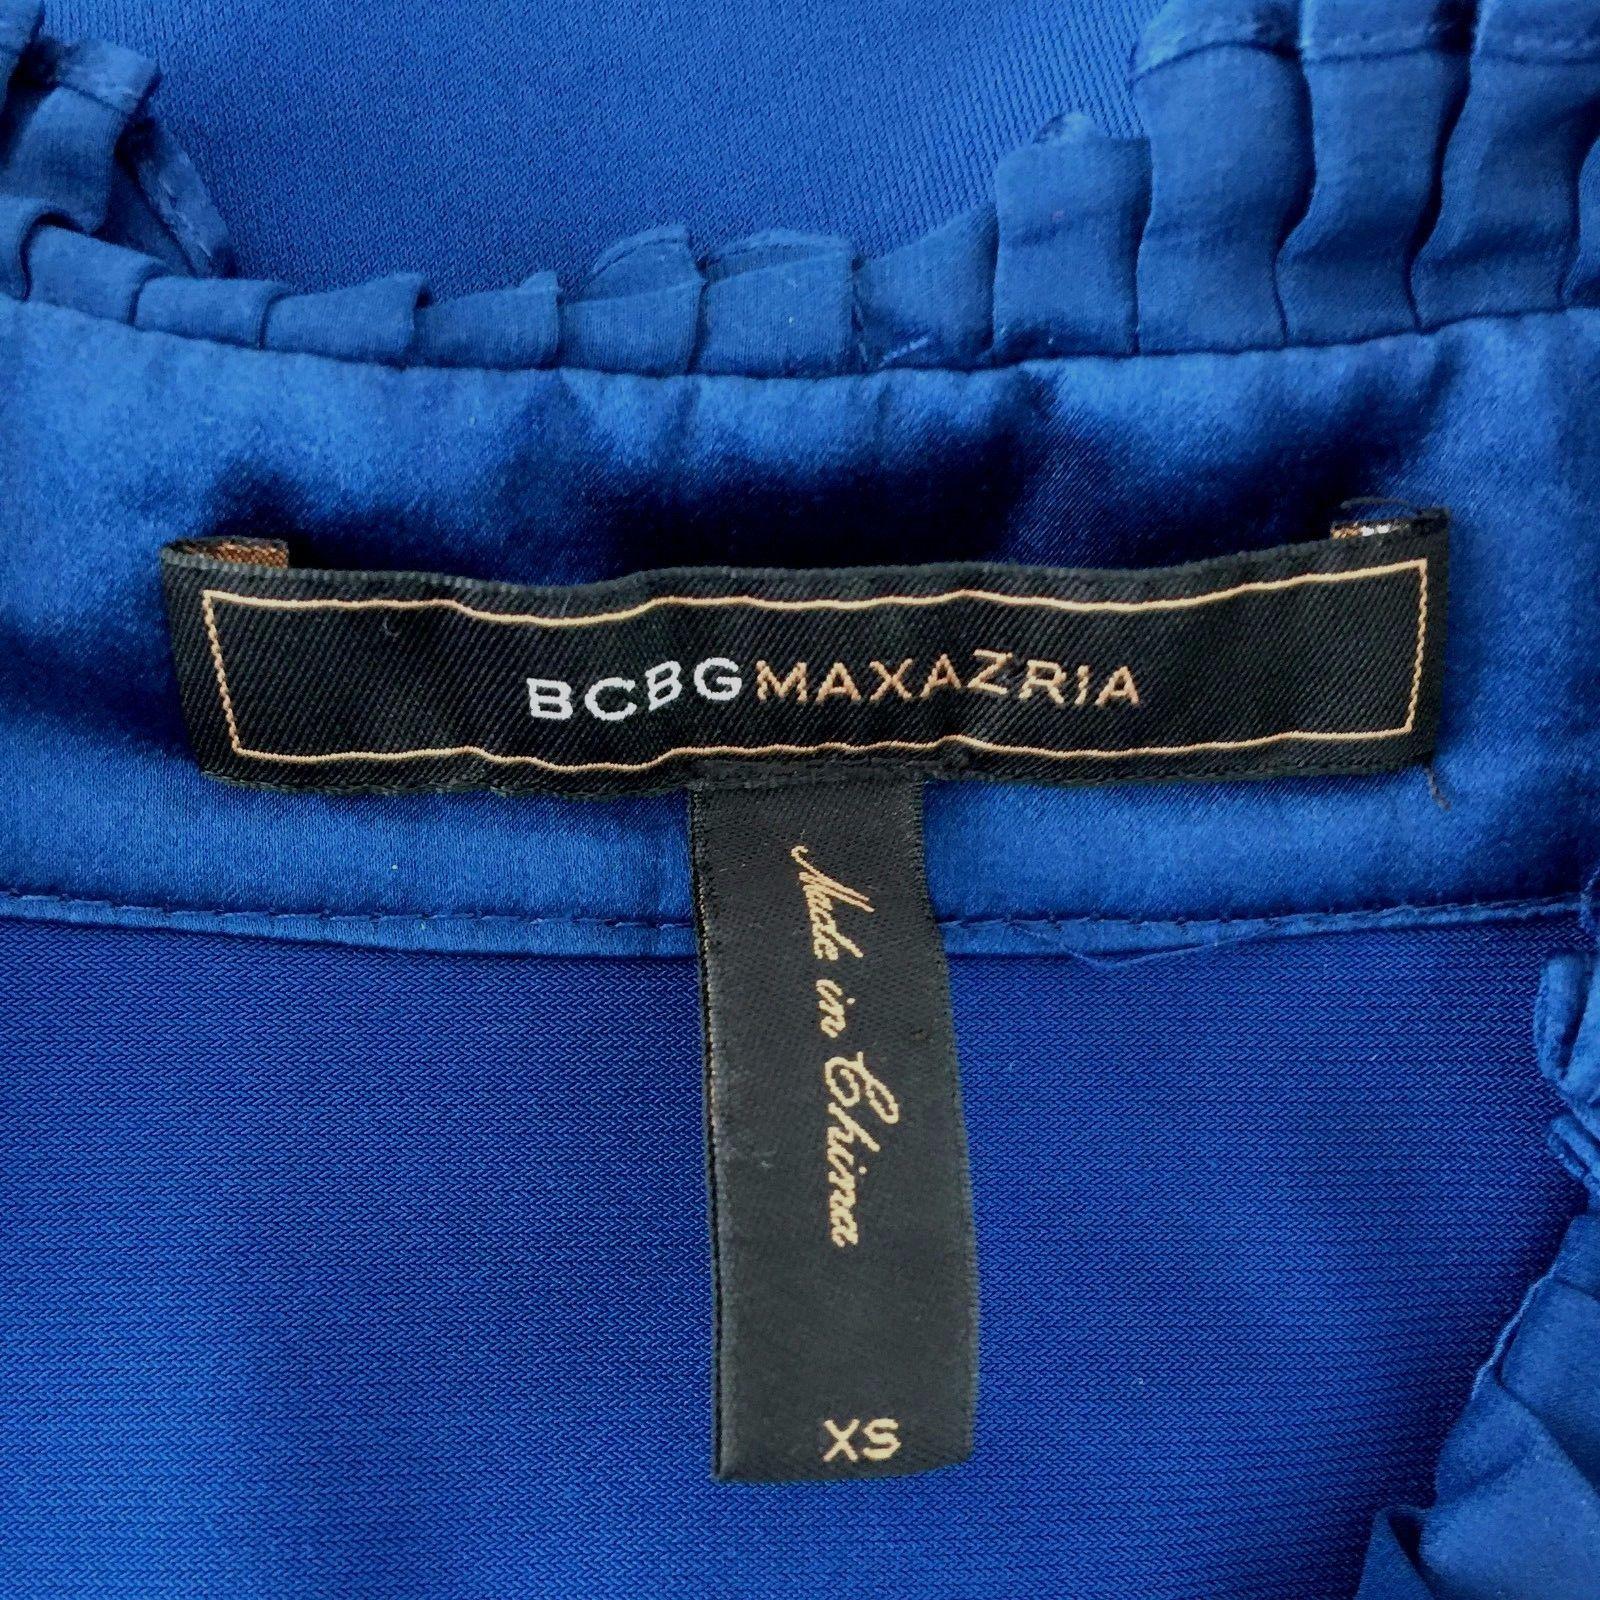 BCBG Max Azria Dress XS Midnight Blue Silk Ruffle Pocket Jersey Stretch